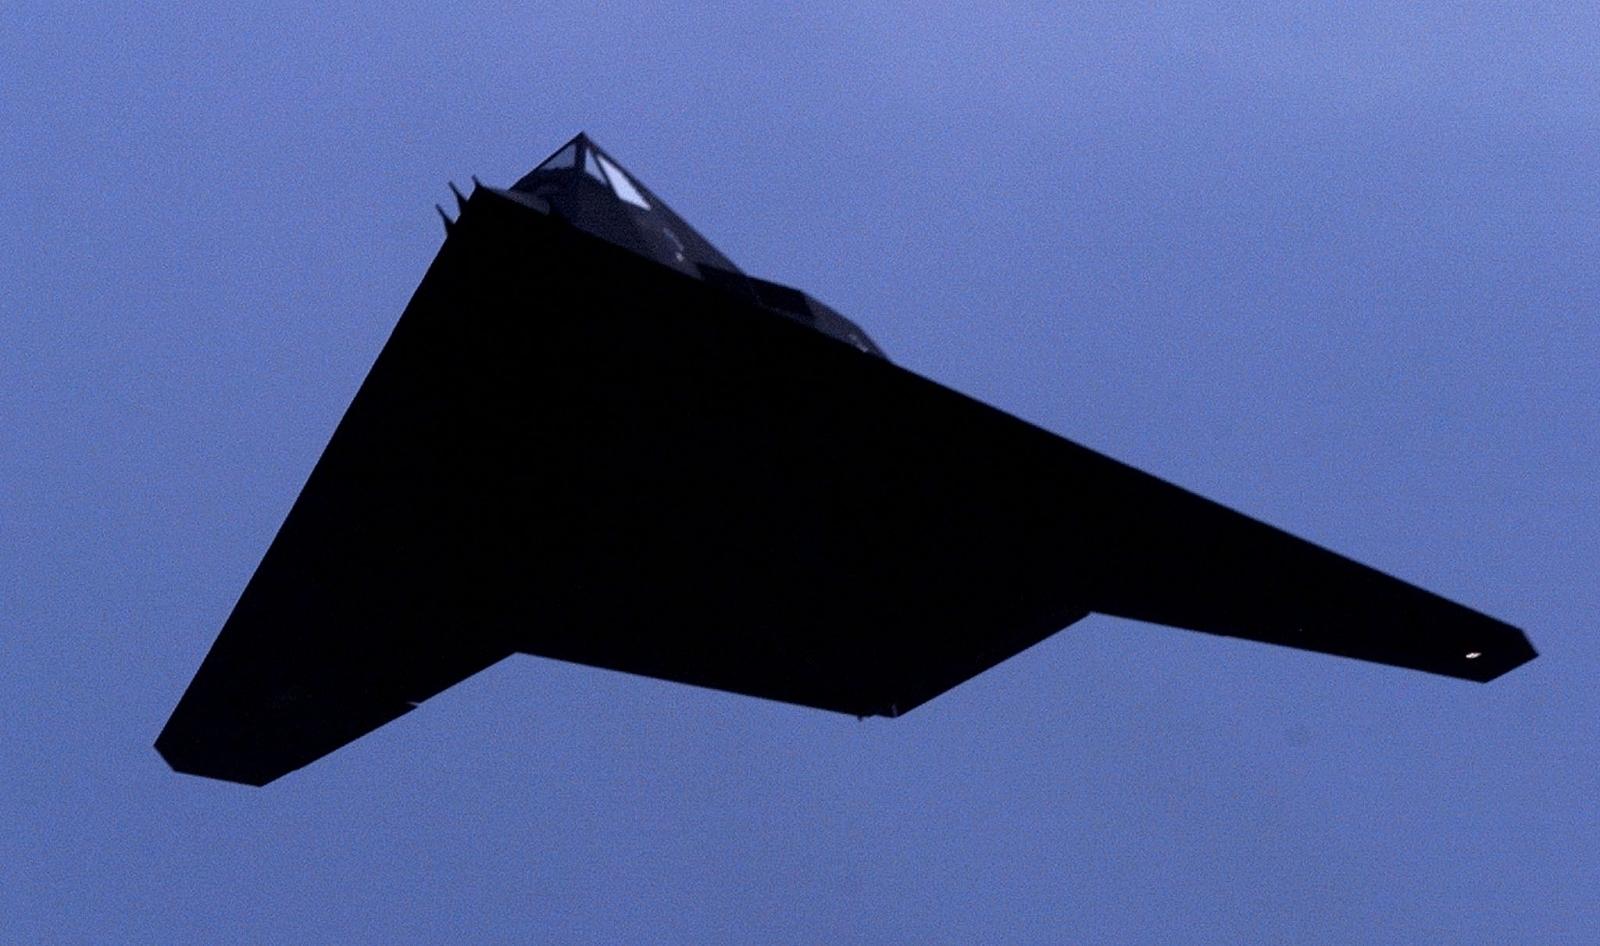 US military mystery aircraft crash